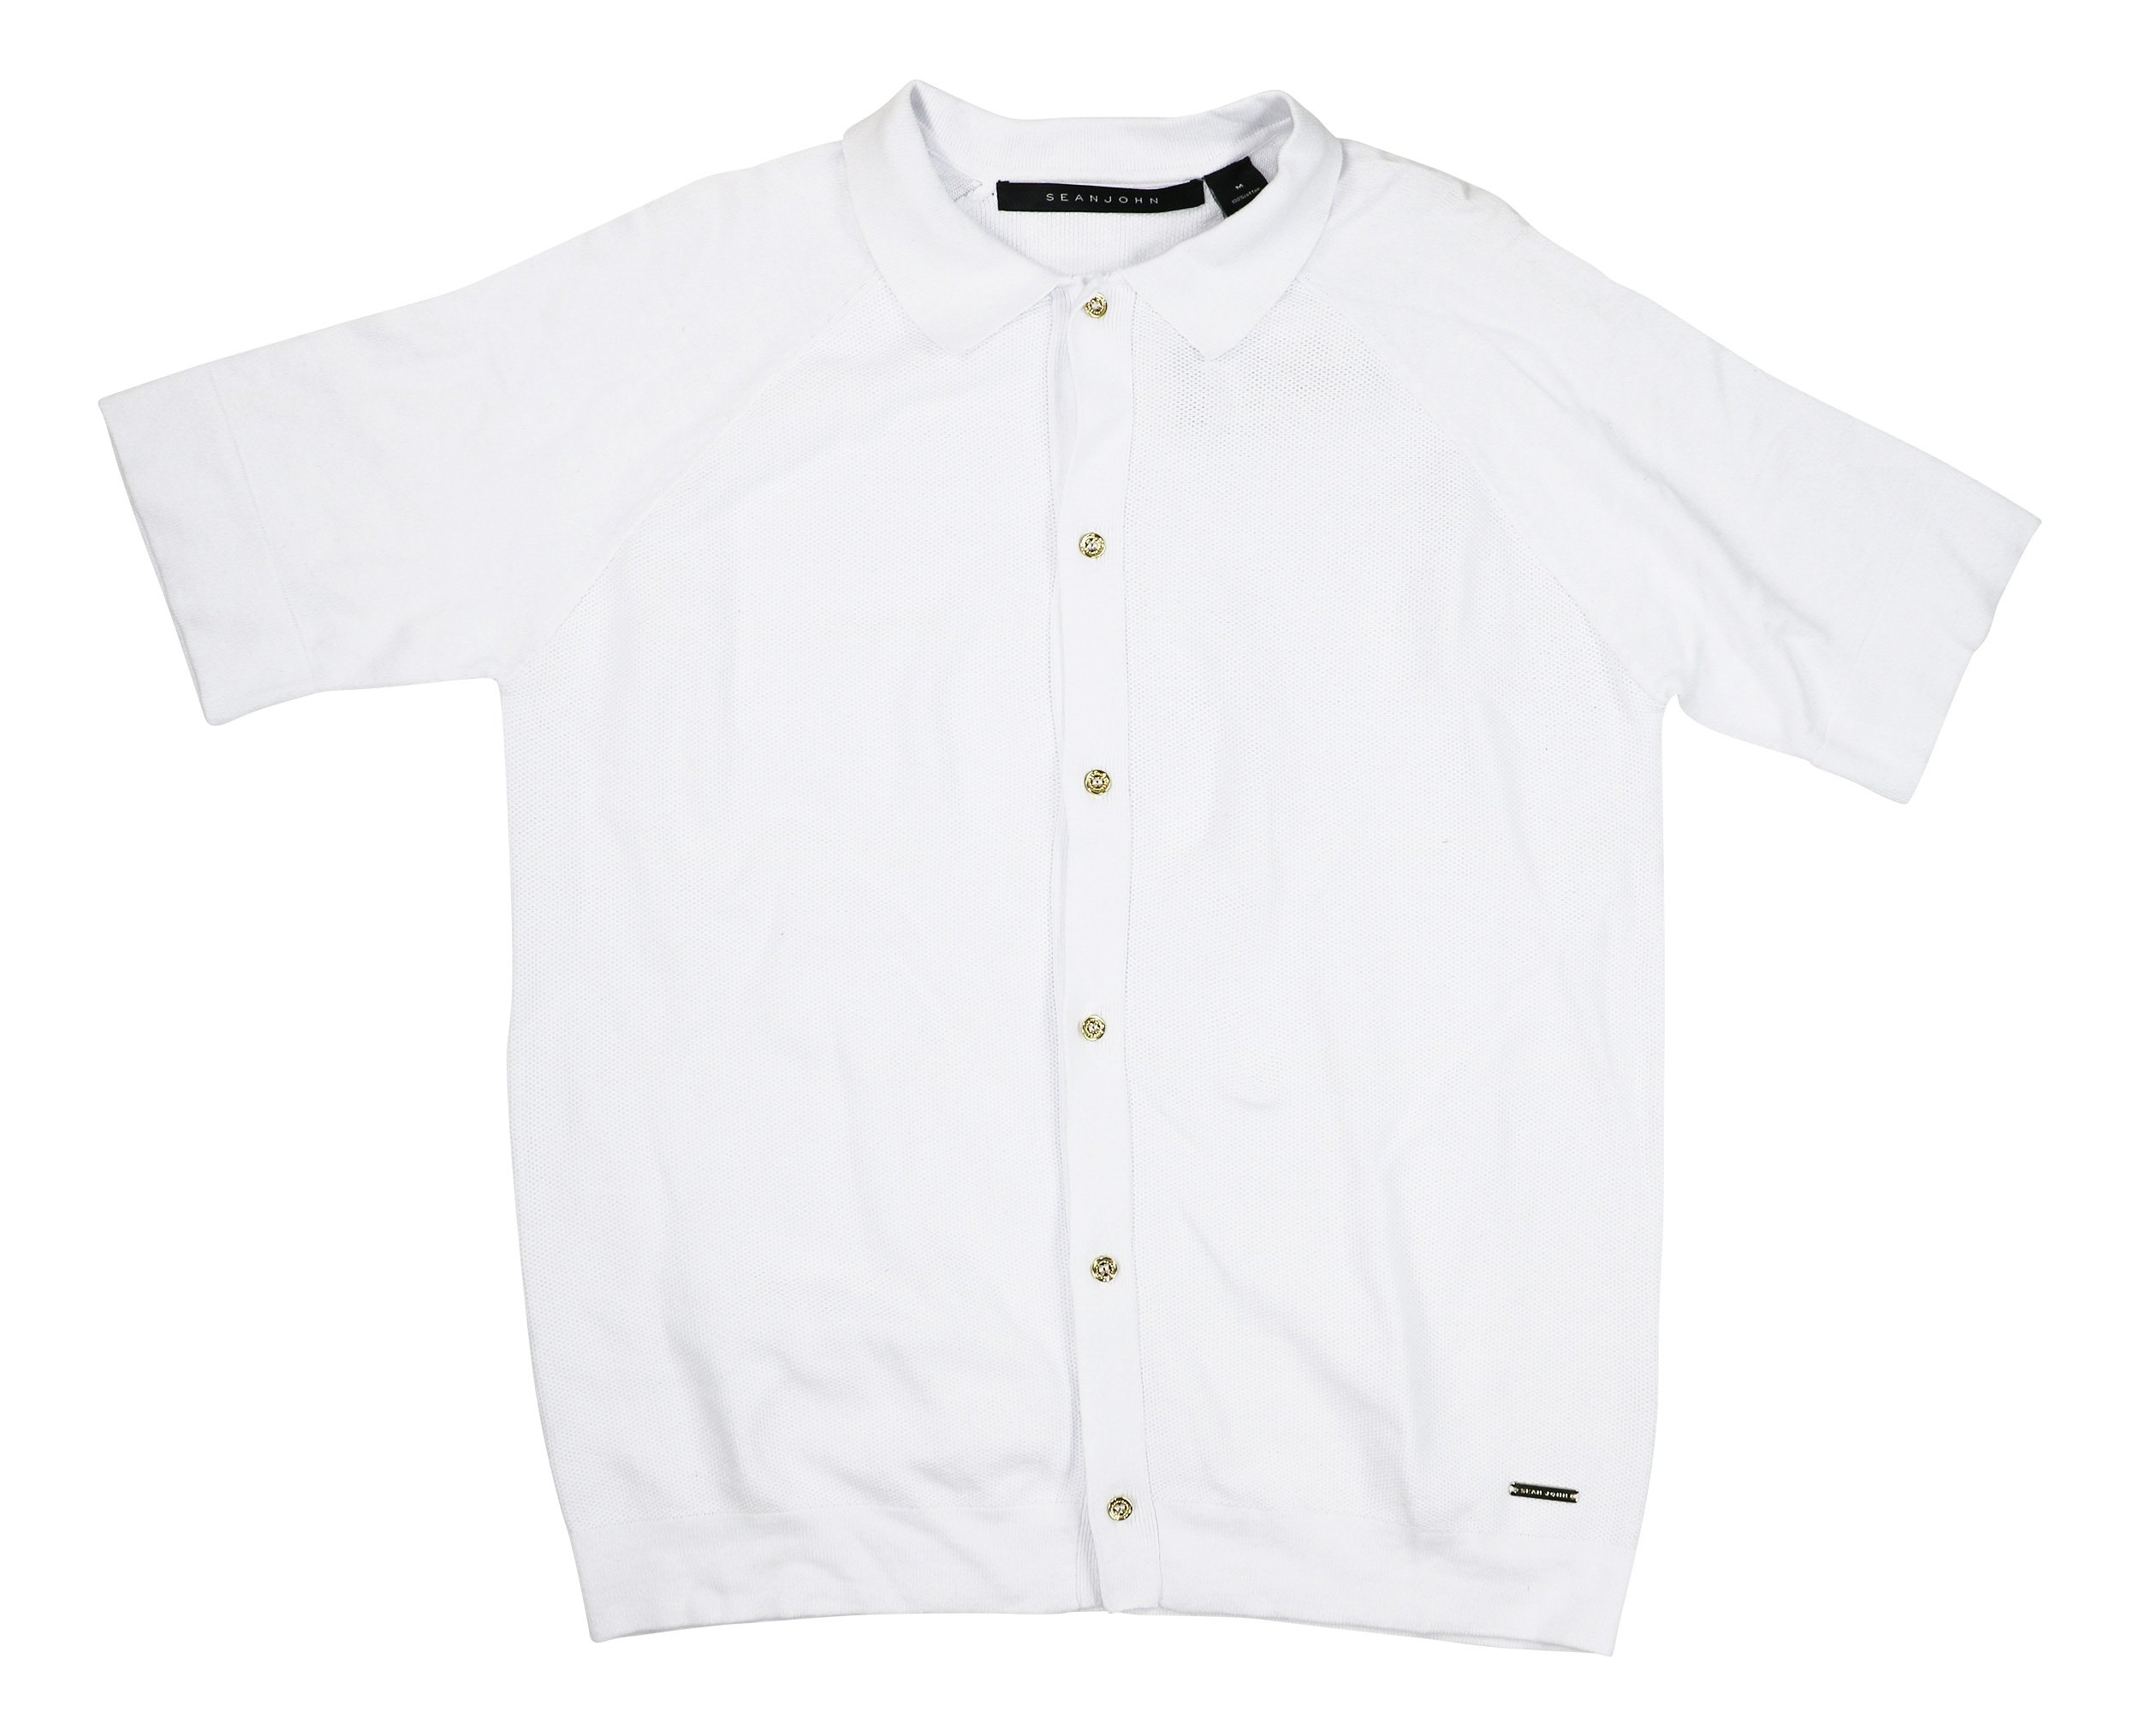 Sean John Mens Short-Sleeve Button-Front Cotton Sweater Bright White 3XL